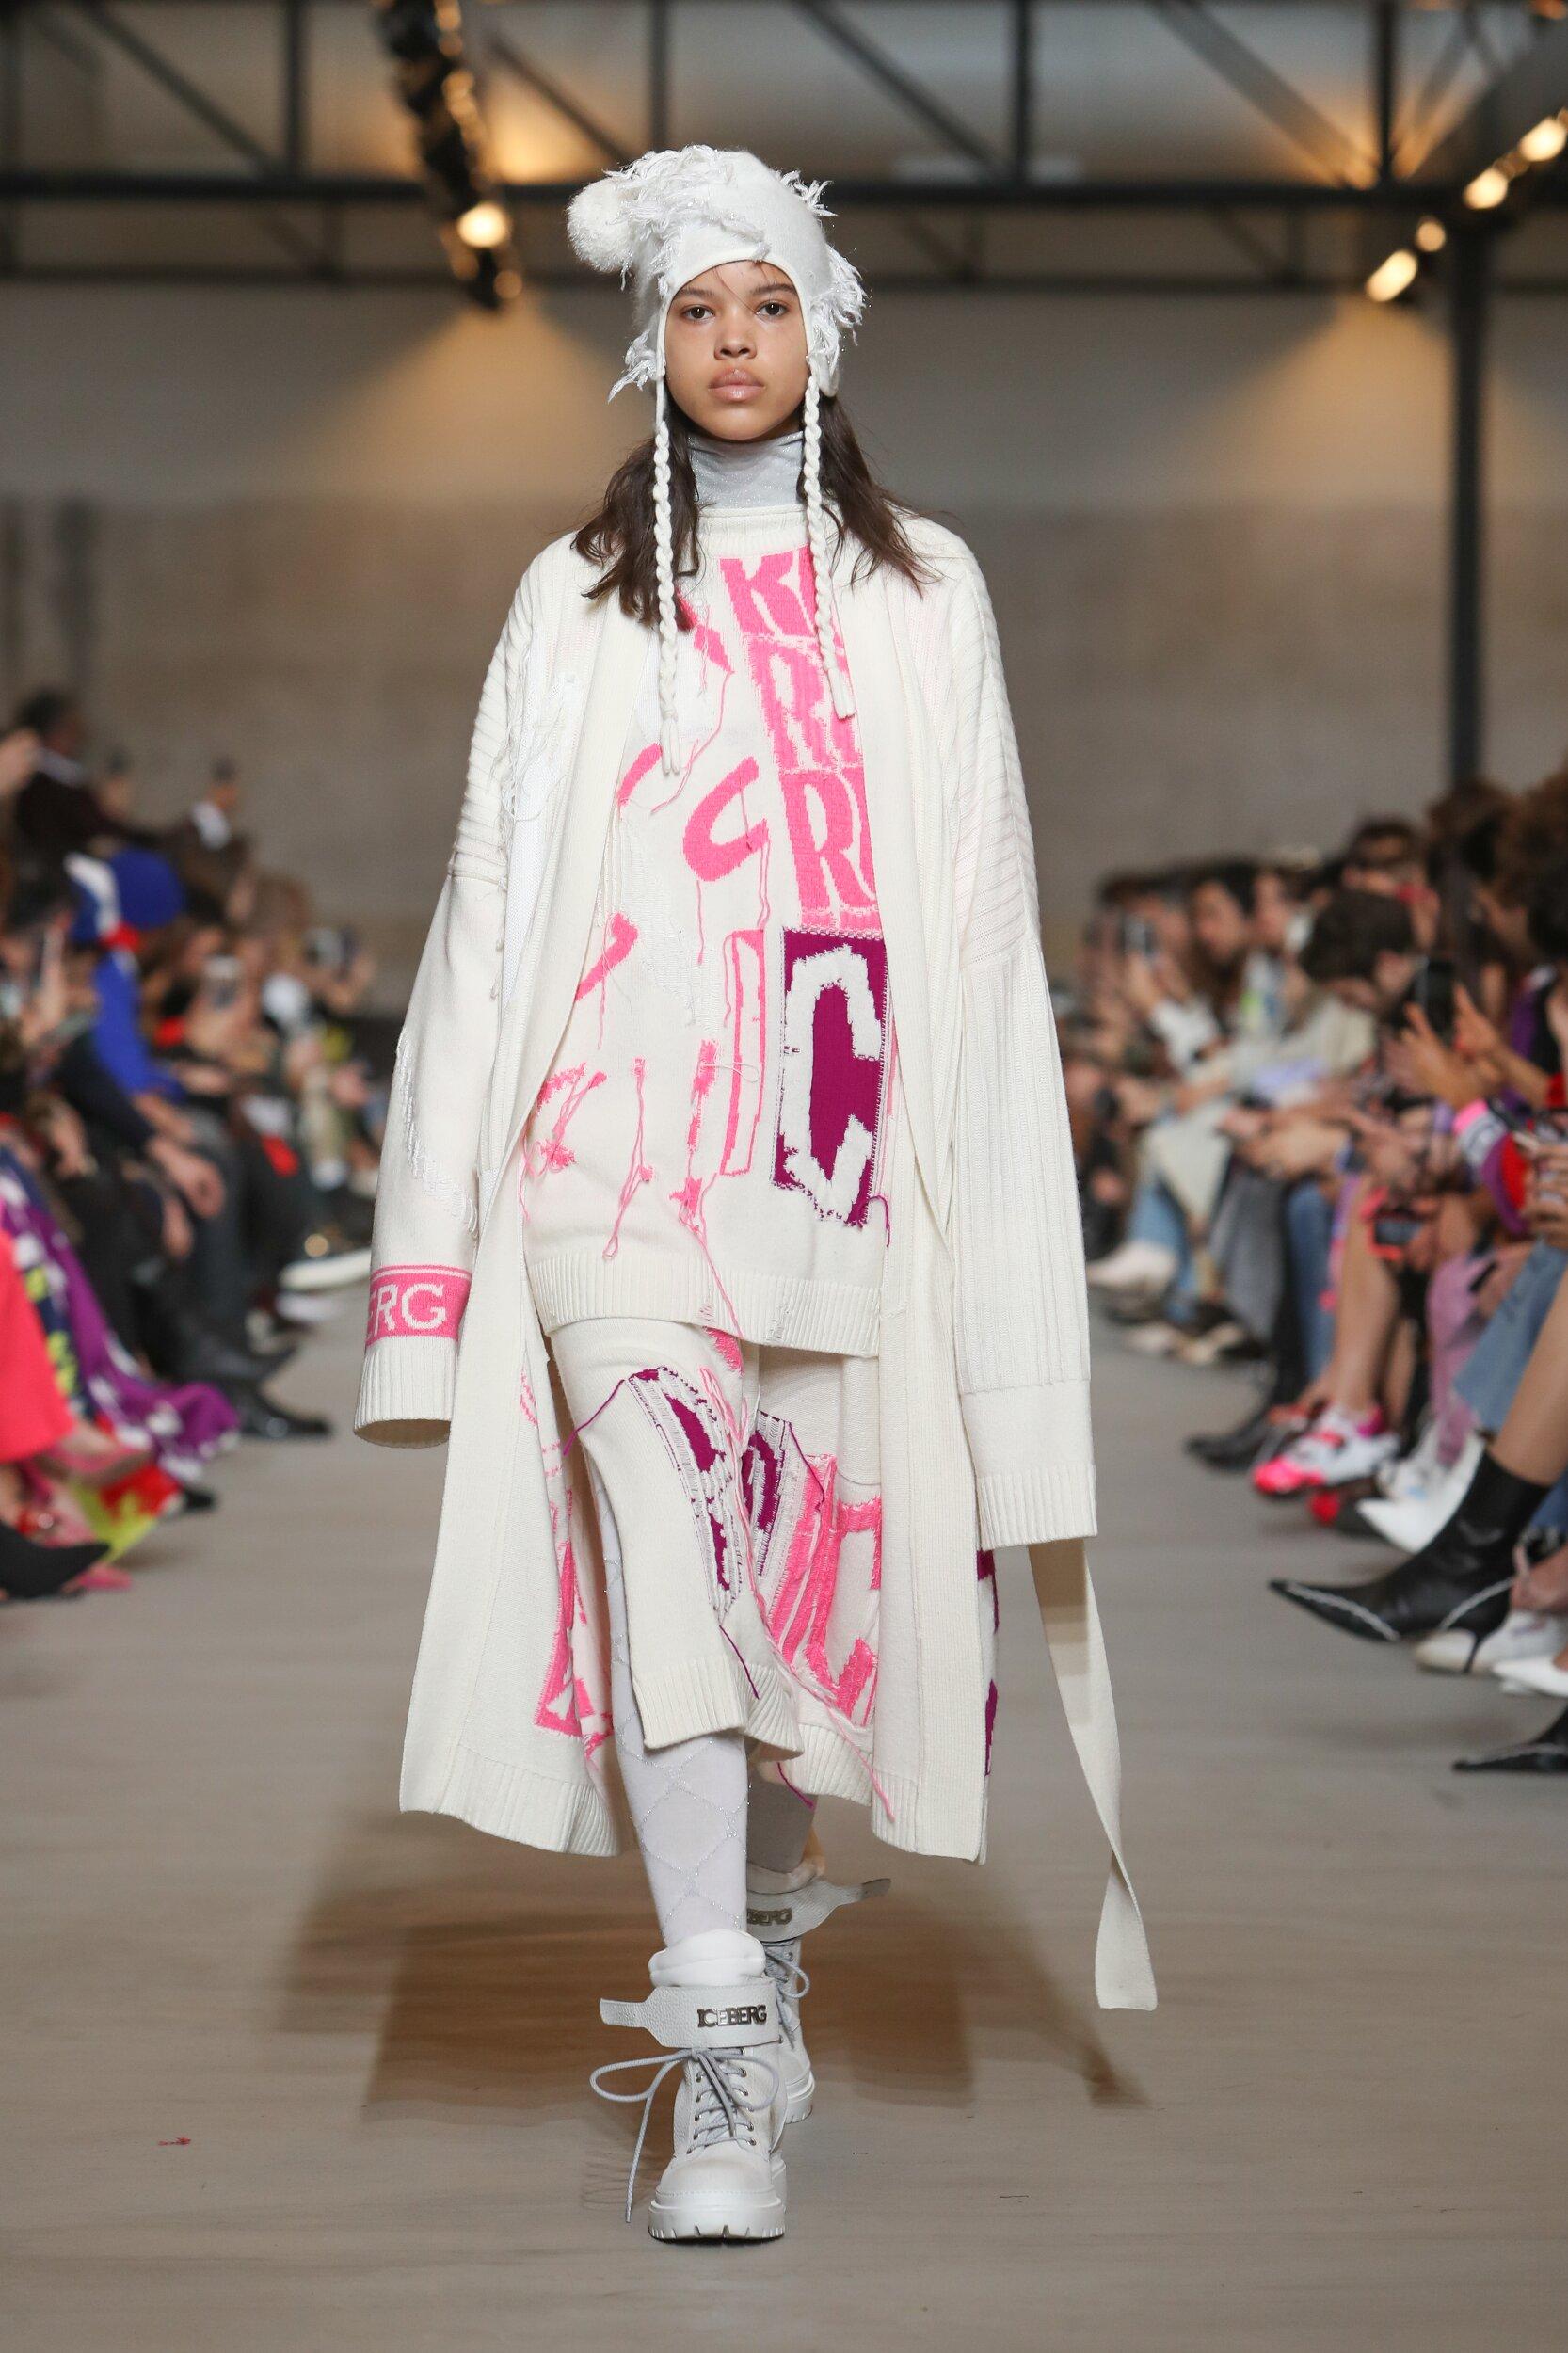 Catwalk Iceberg Woman Fashion Show Winter 2020